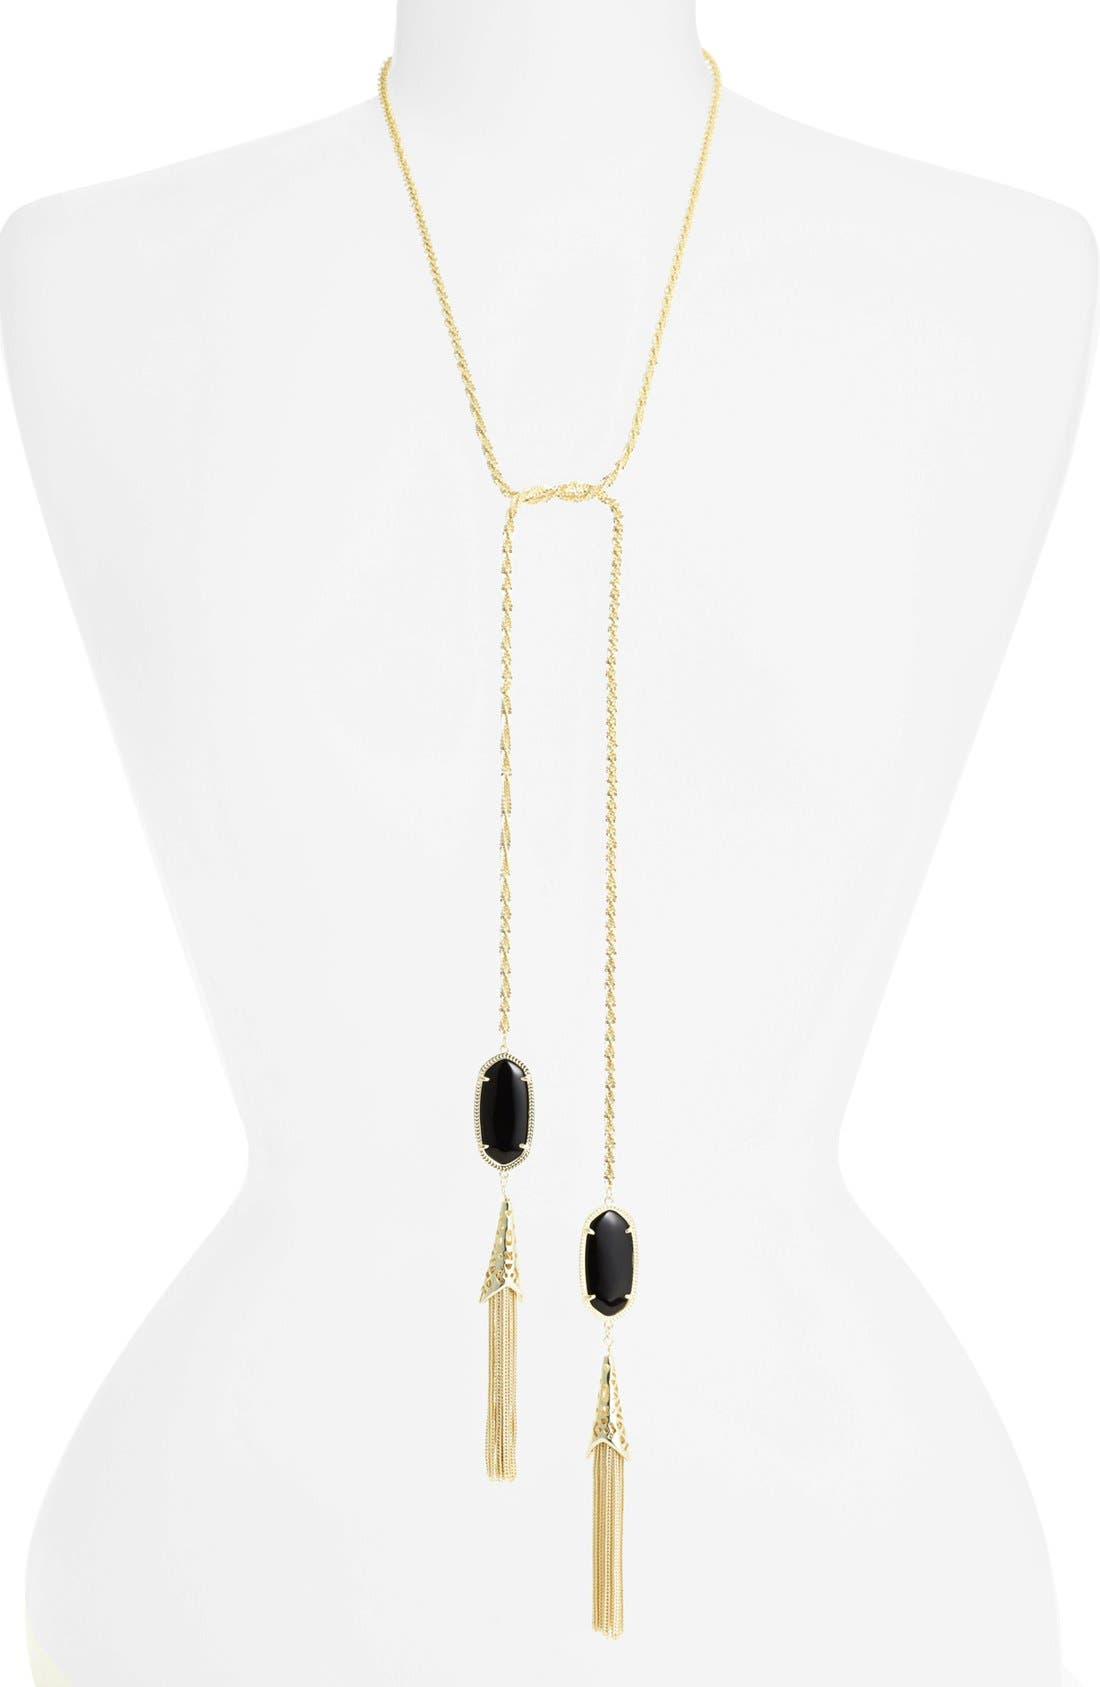 Main Image - Kendra Scott 'Megan' Oval Stone & Fringe Chain Necklace